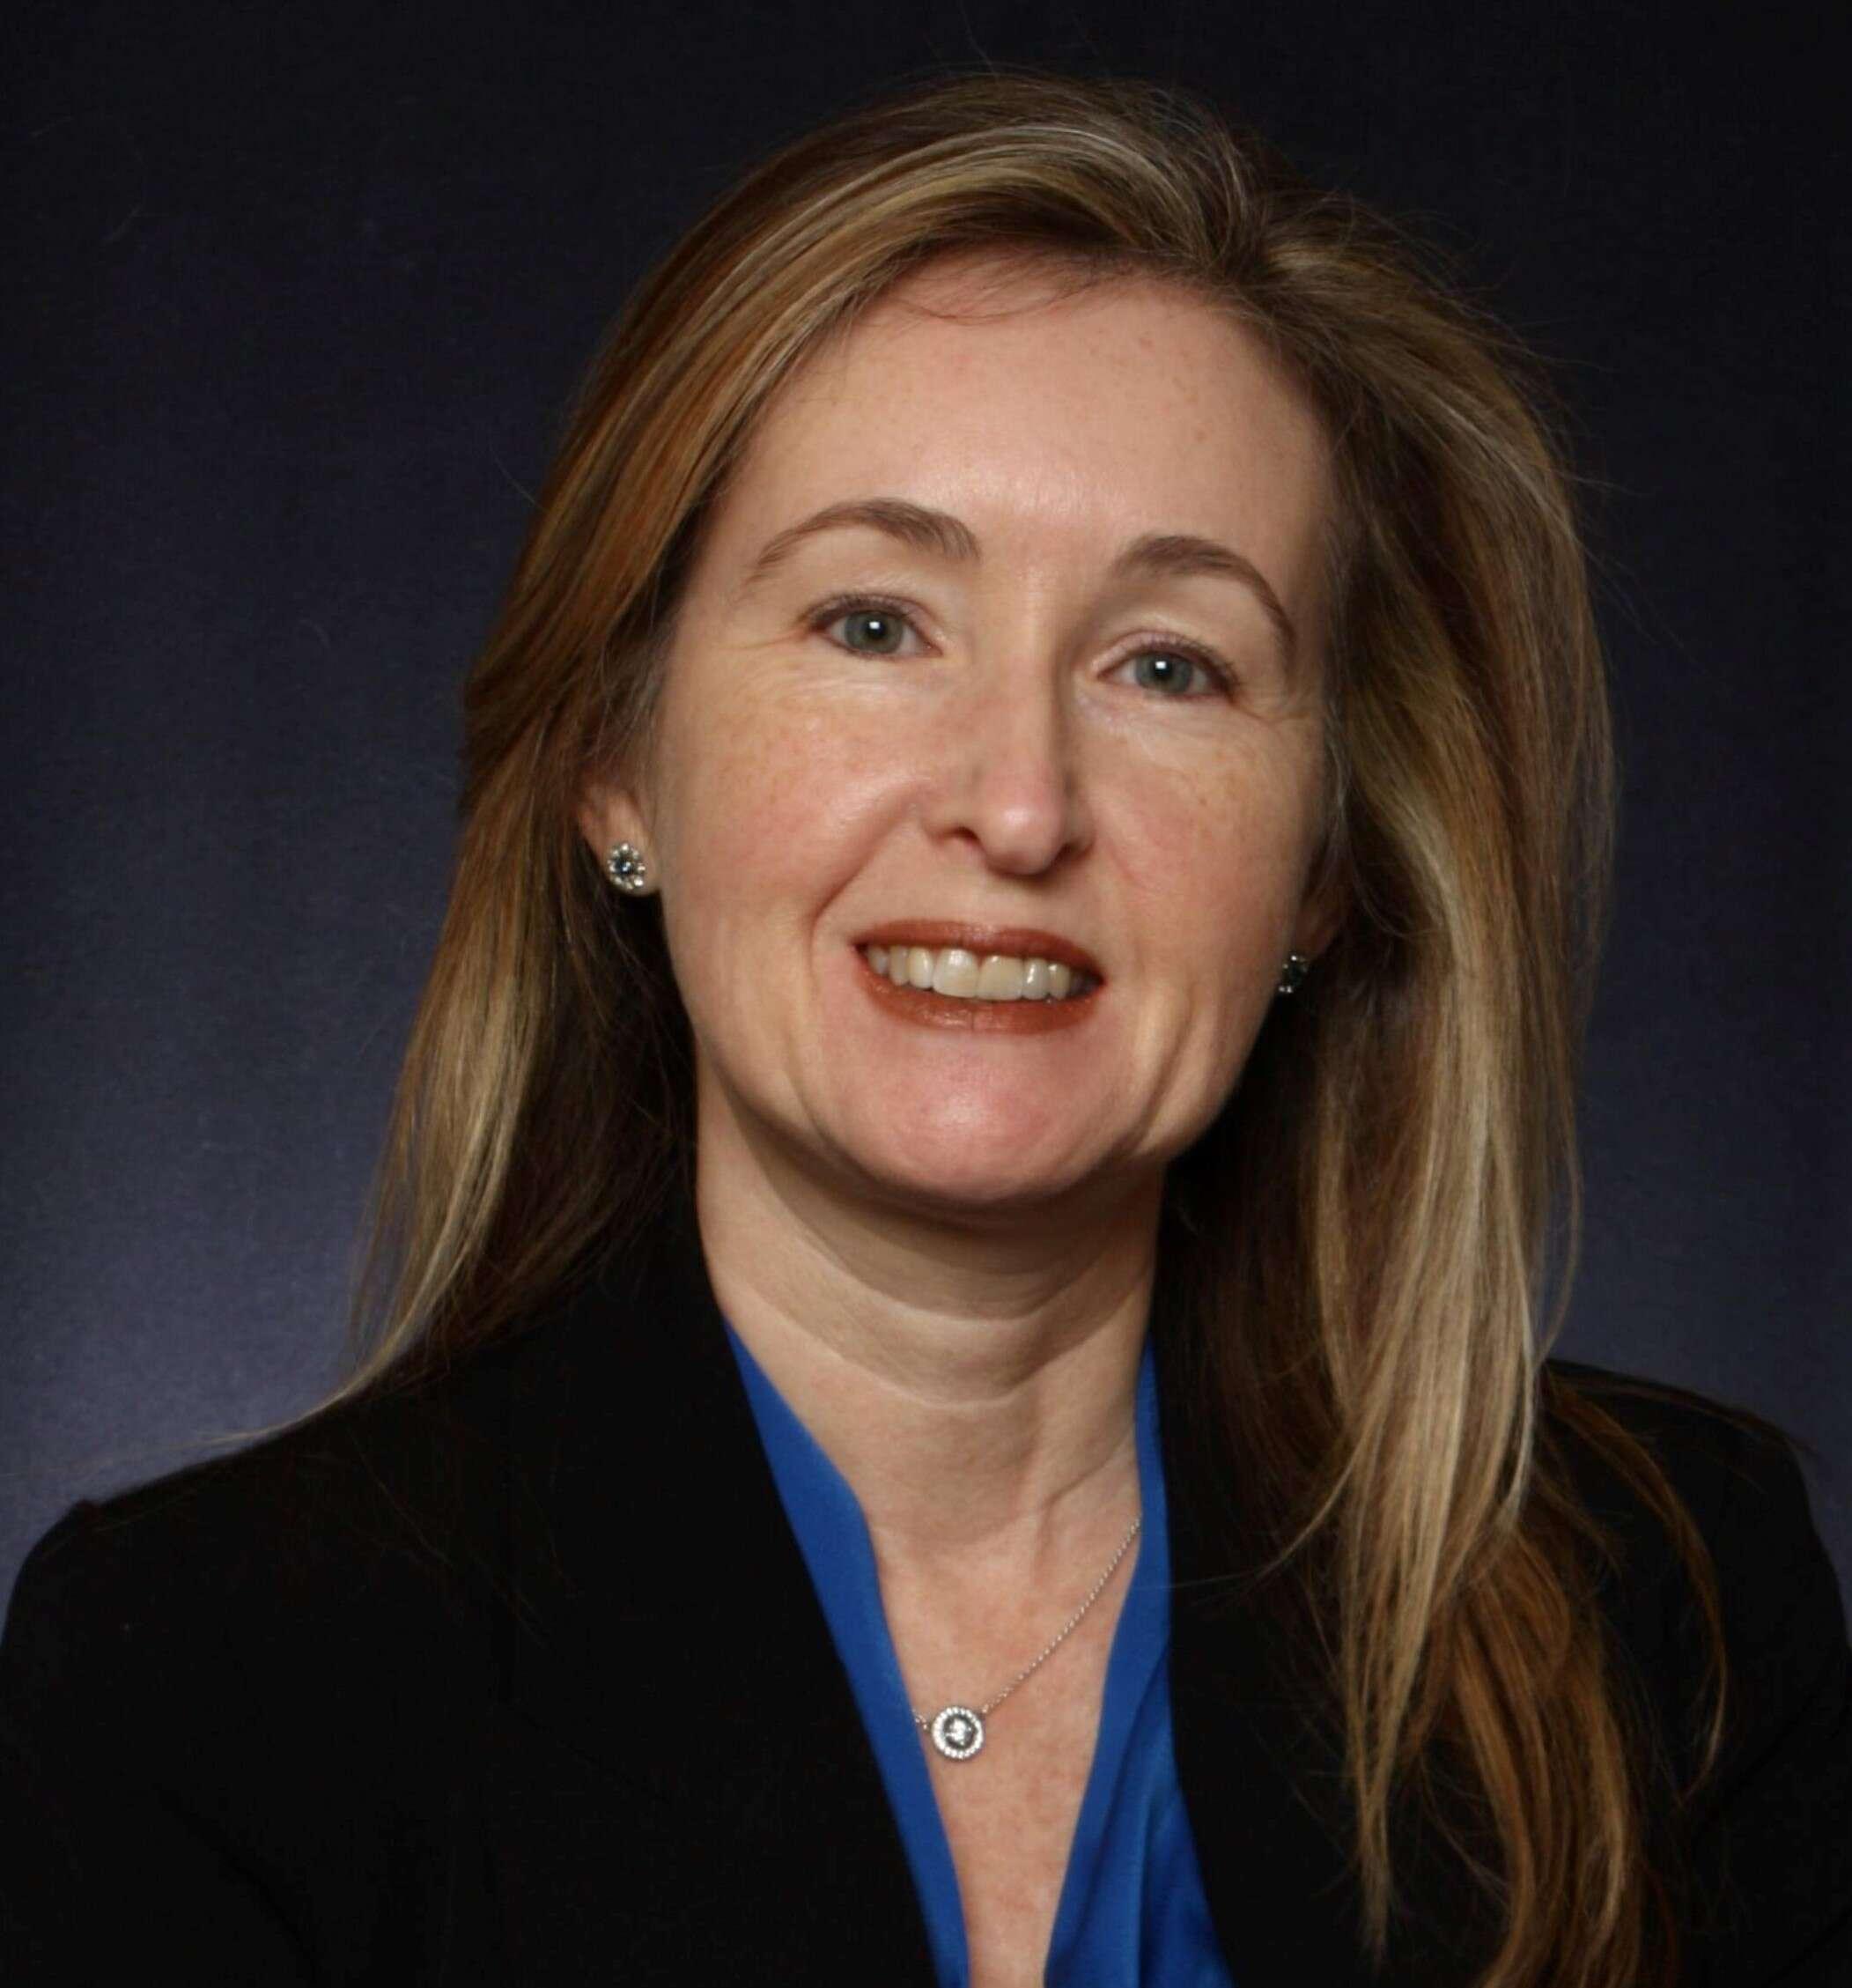 Sherry Gratton